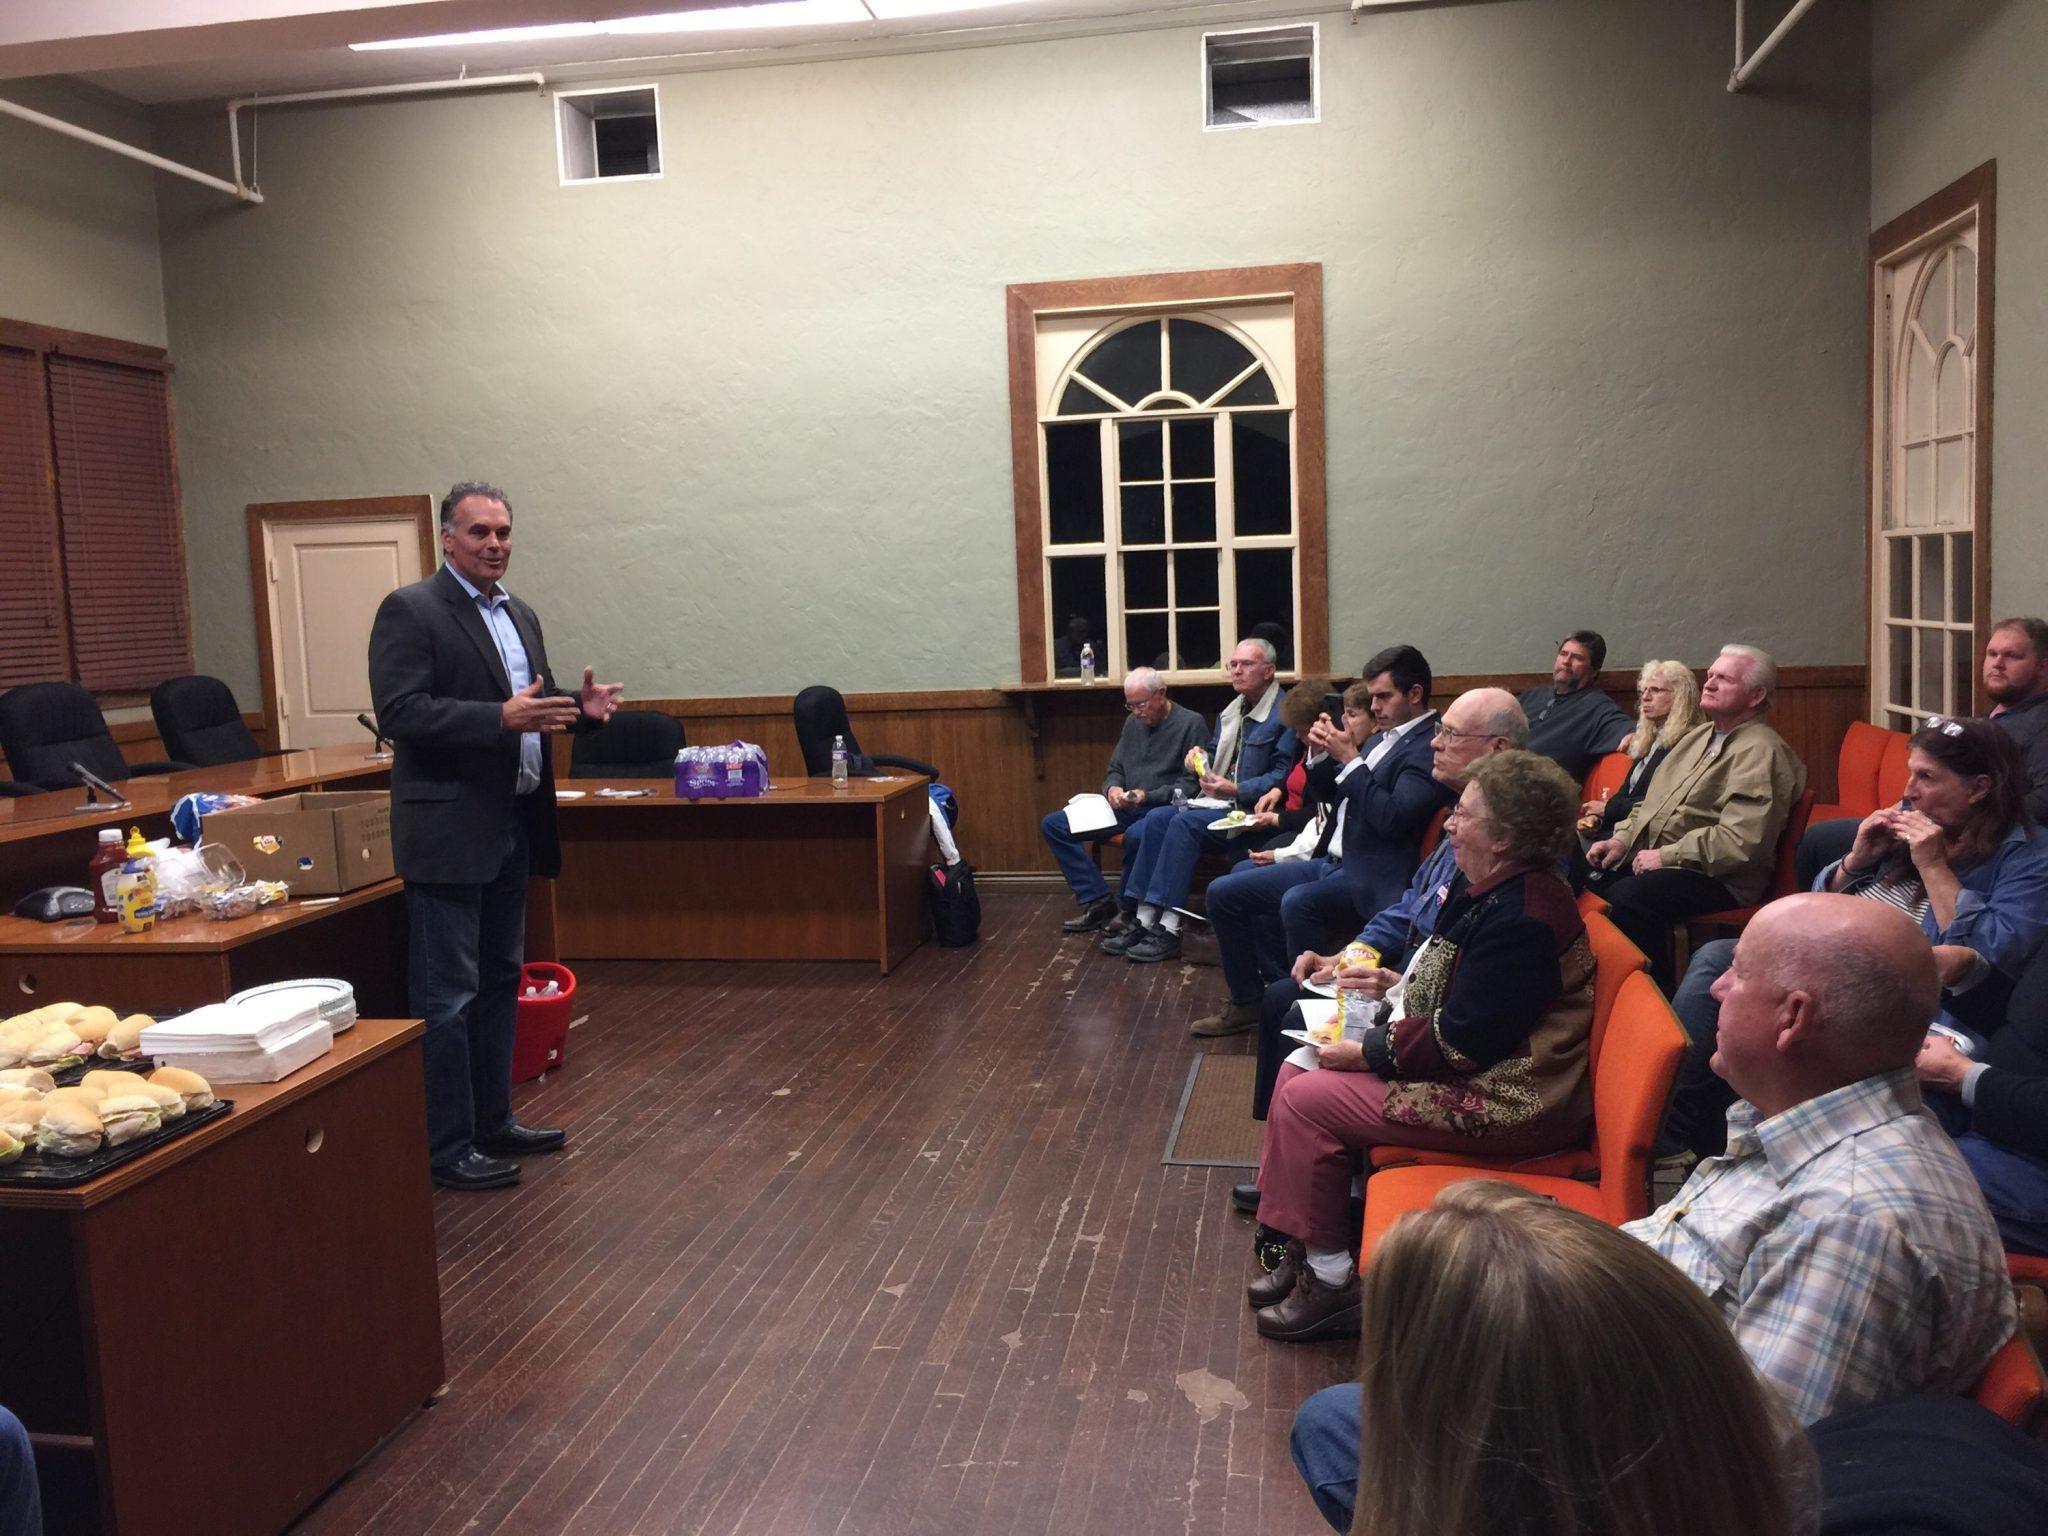 U.S. Senate Candidate Danny Tarkanian Campaigns in Caliente, Alamo